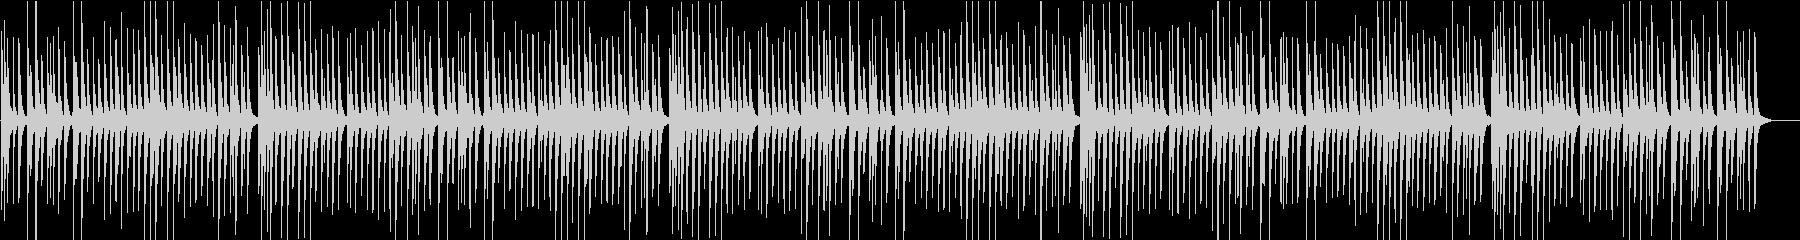 "Okinawa folk song ""Jyukunoharu"" Sanshin only's unreproduced waveform"